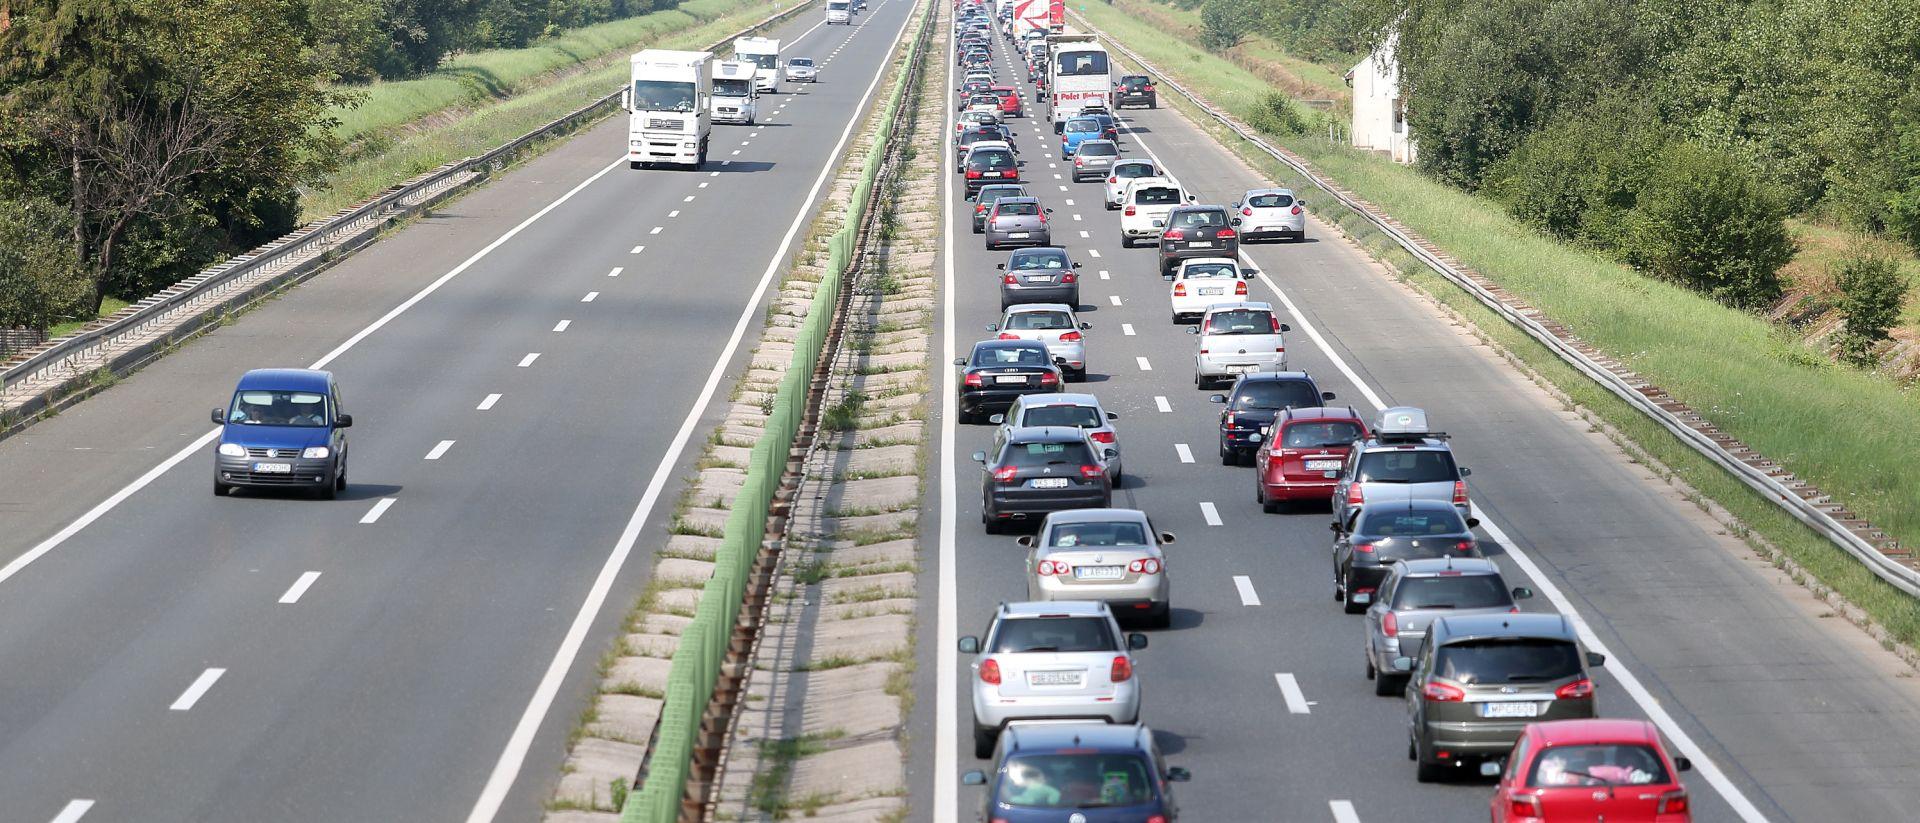 Vozilo u krivom smjeru na A3 Bregana- Lipovac